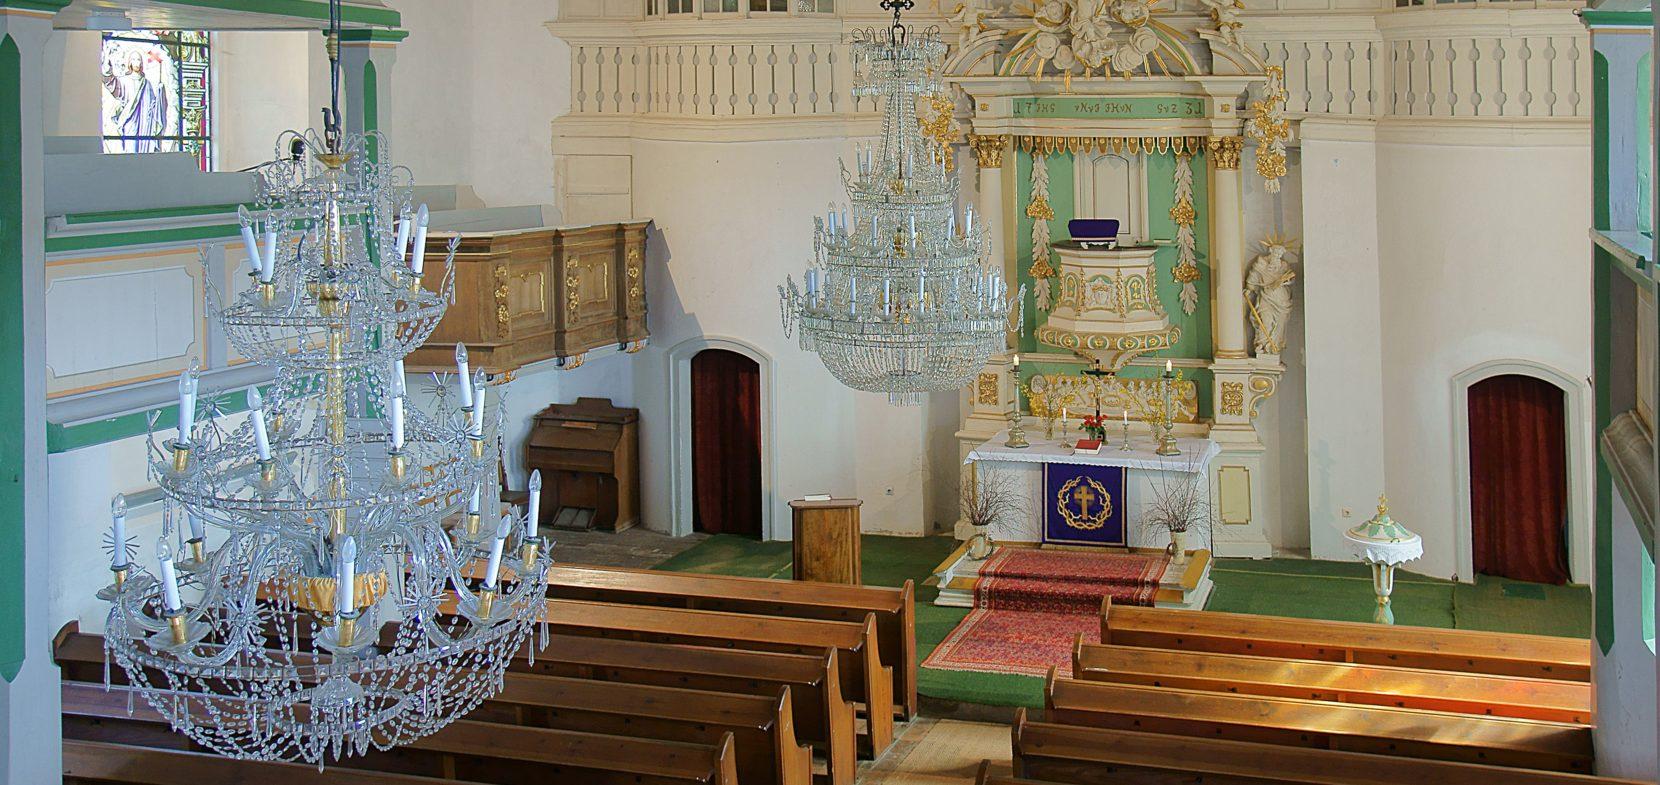 Ev.-Luth. Kirchgemeinde Wehrsdorf